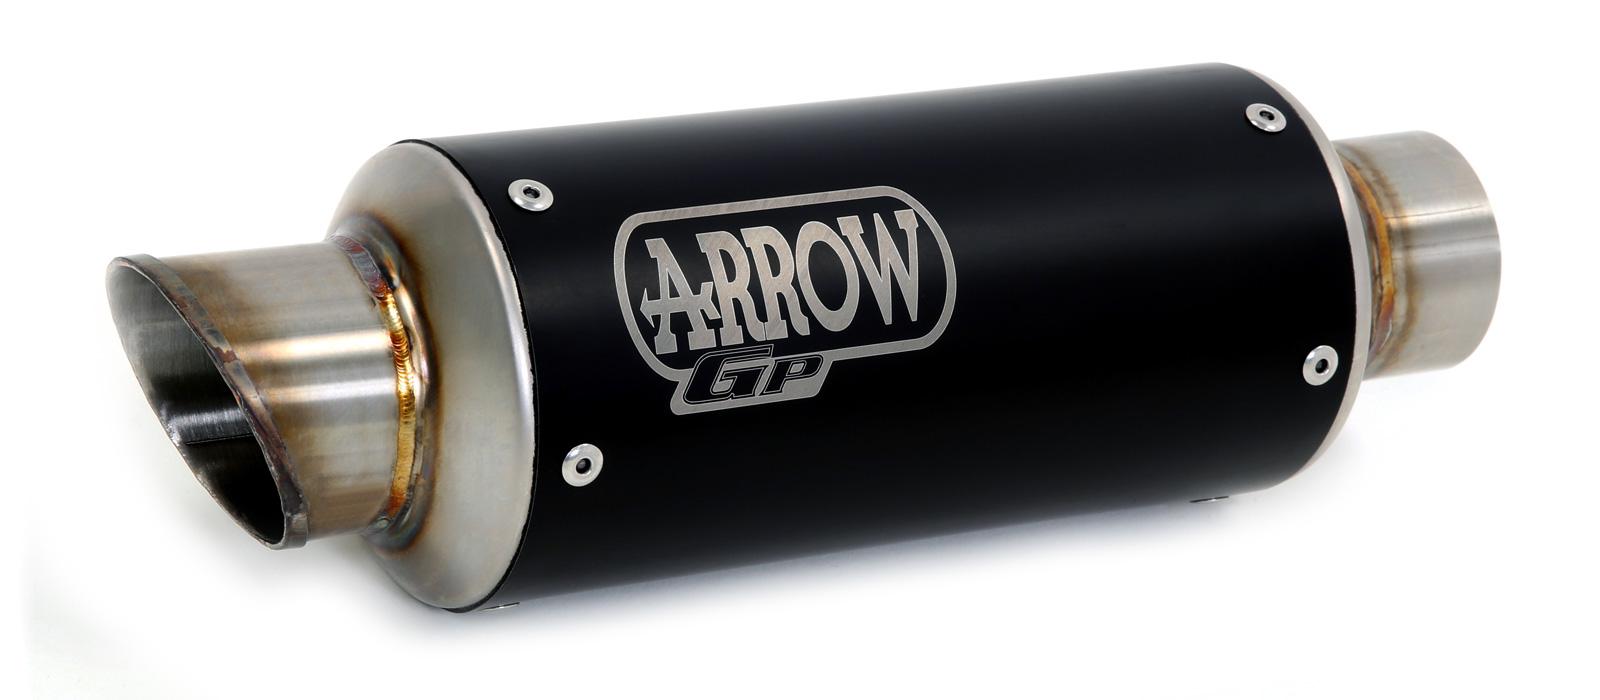 ARROW Racing-Auspuff DARK GP2 für Kawasaki Z650 2017- aus Edelstahl